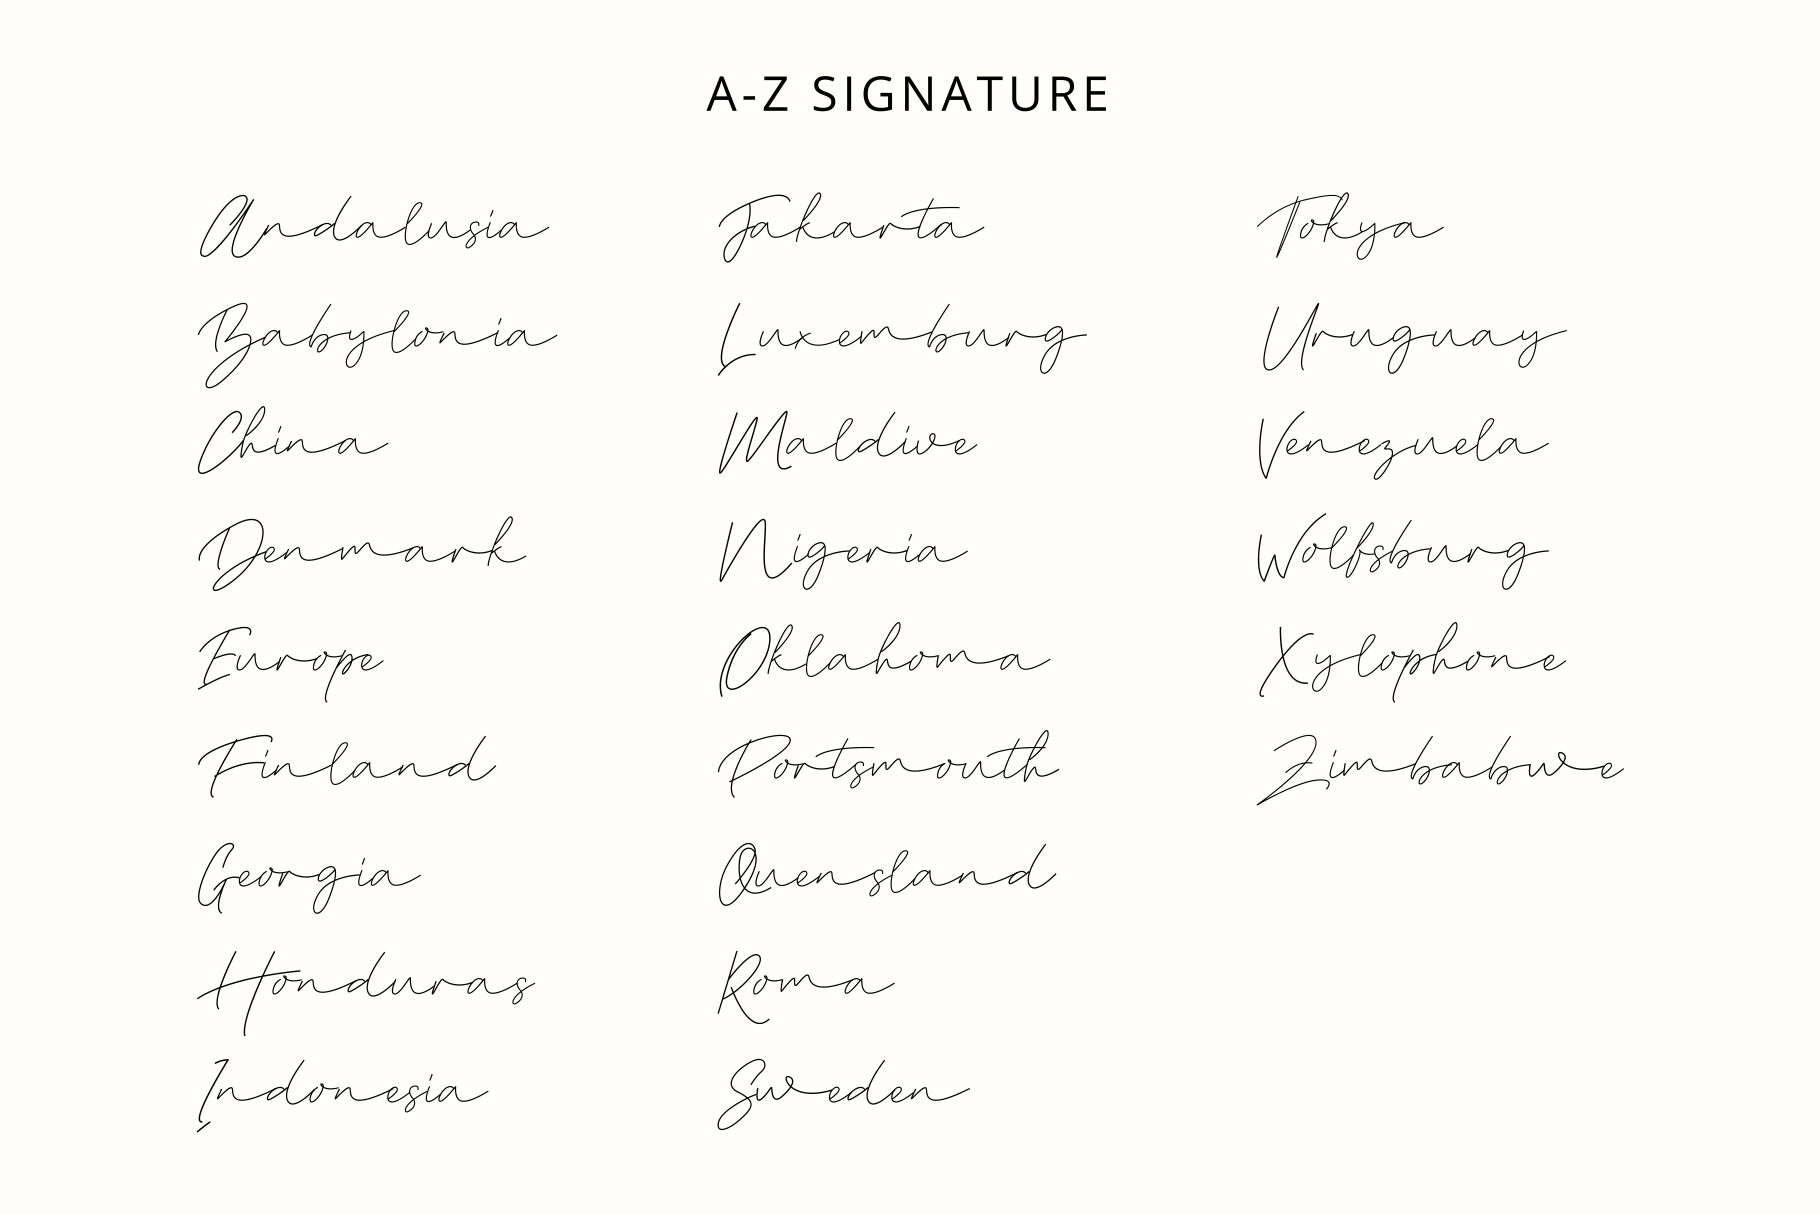 Syalatan - The Handwritten Signature example image 7